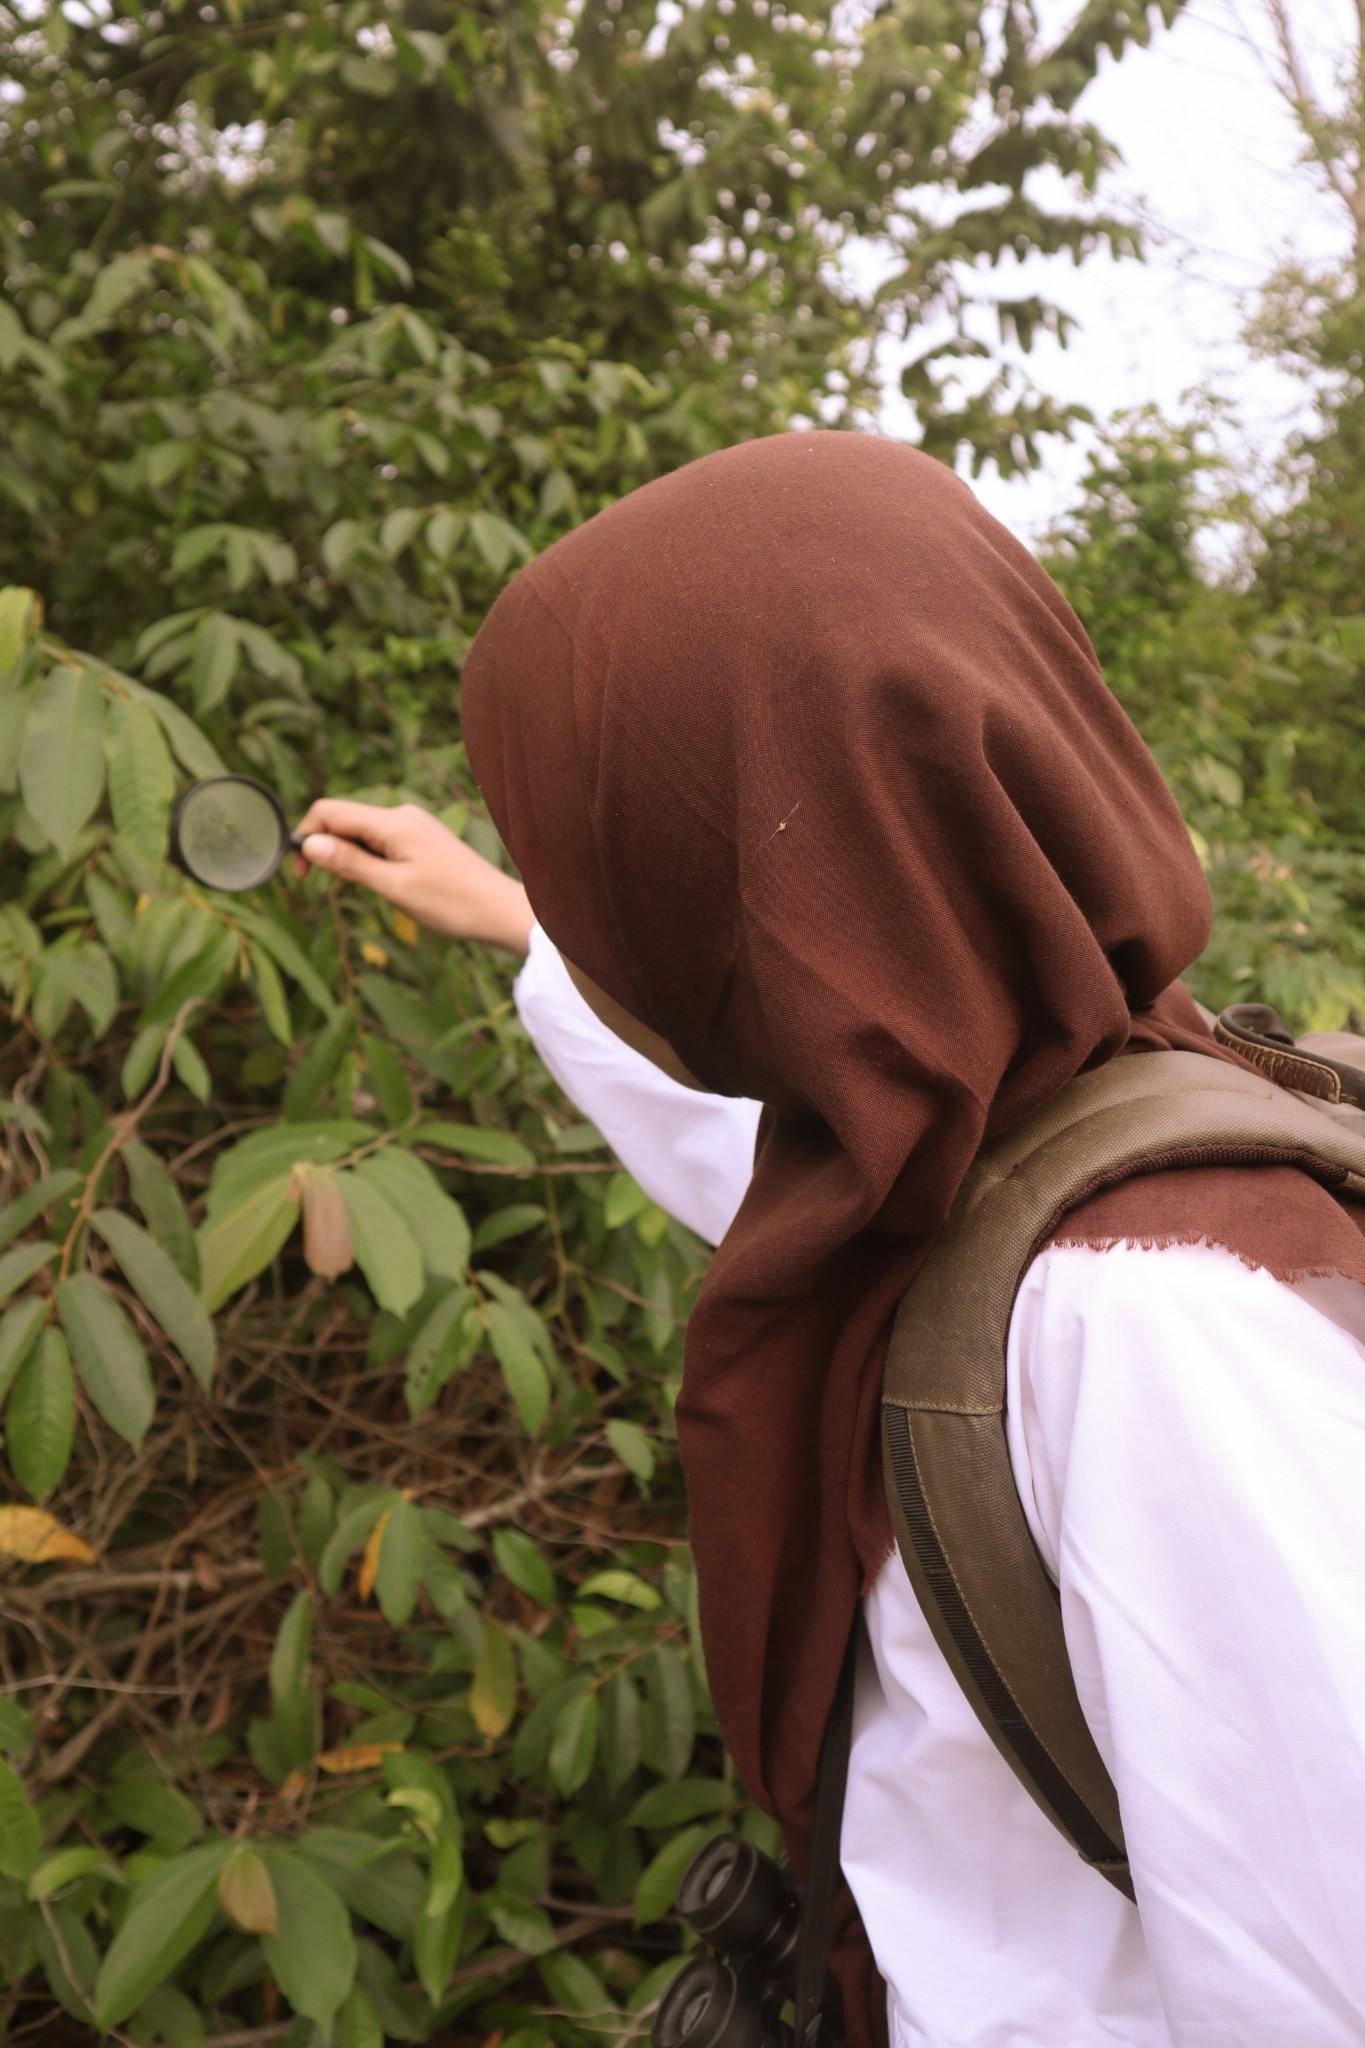 #hijab #hijabstyle #hijabfashion #hijabers #gamis #jilbab #fashion #muslimah #hijabsyari #hijabmurah #ootd #gamissyari #khimar #like #islam #muslim. Hijab Aesthetics Explore Tumblr Posts And Blogs Tumgir